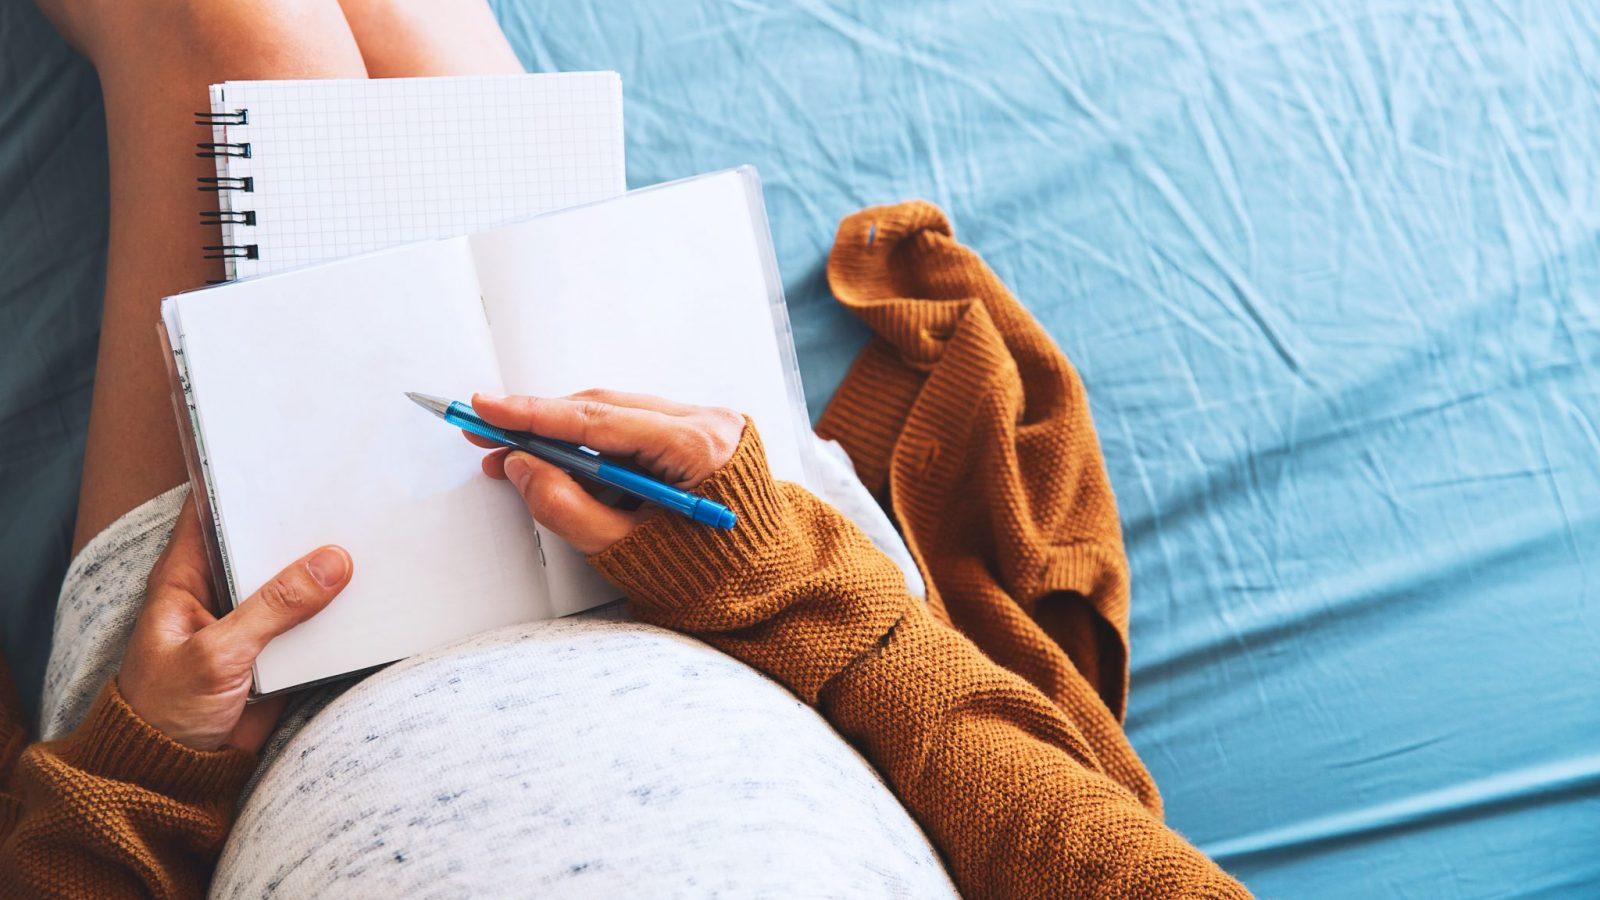 Pregnant woman writing her birth plan